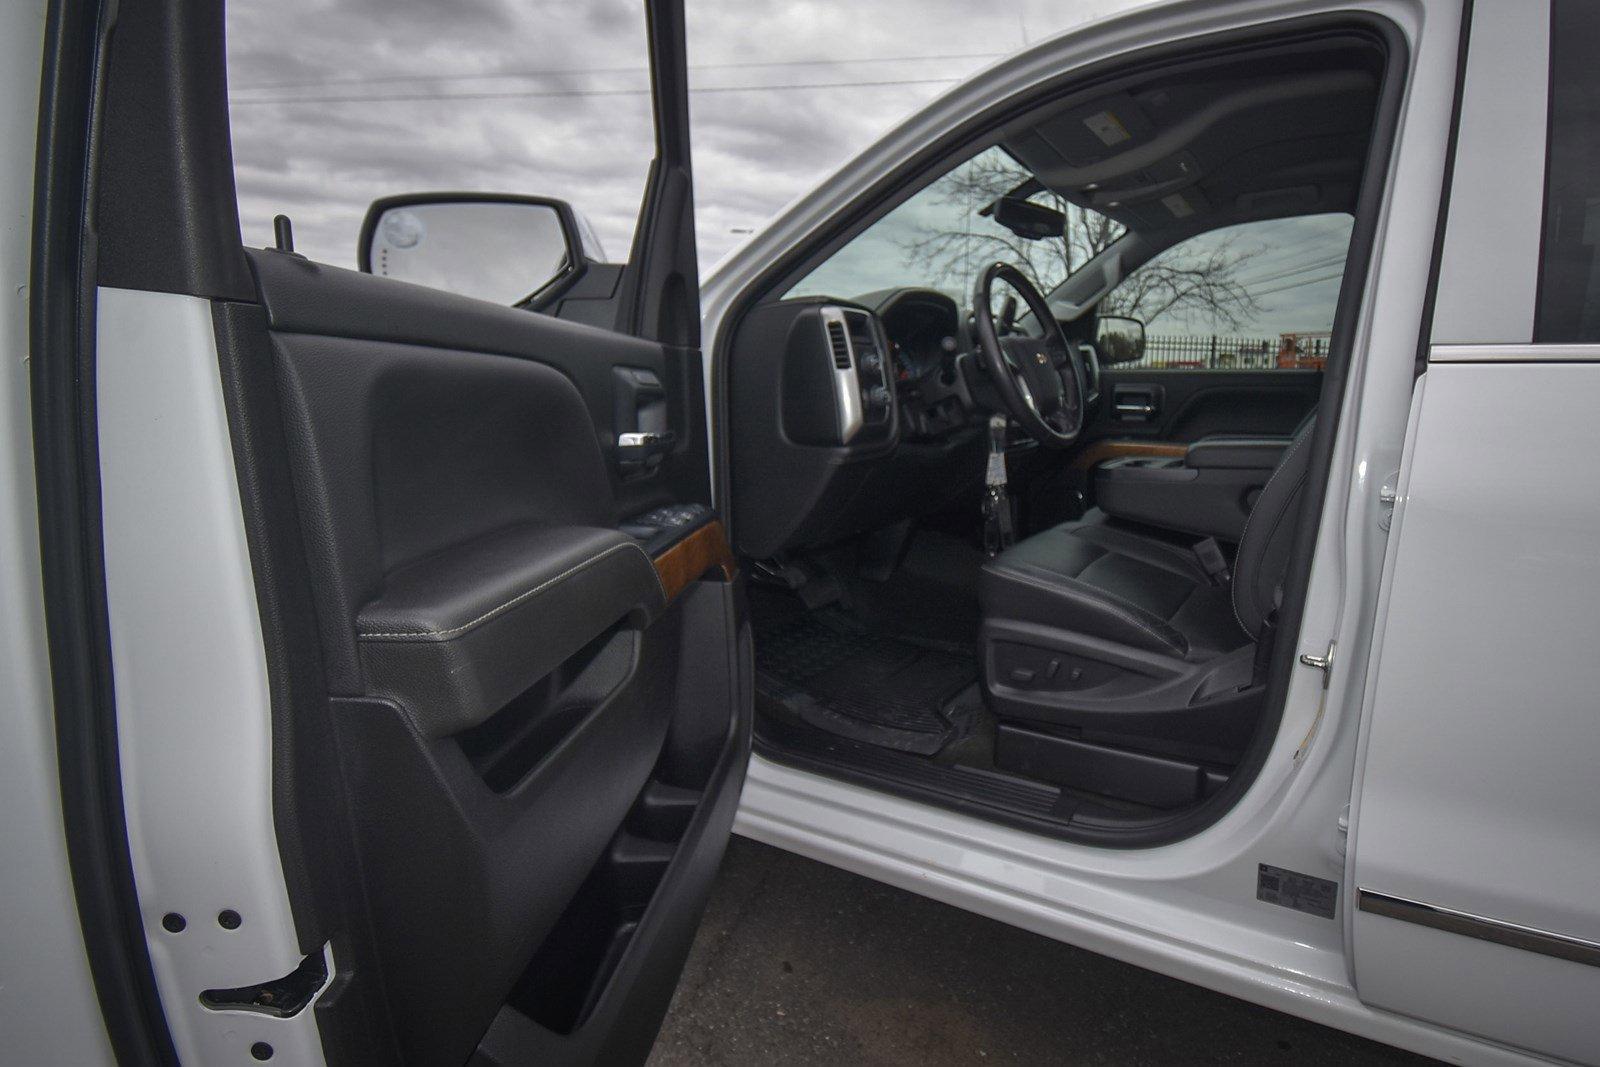 Pre-Owned 2018 Chevrolet Silverado 1500 LTZ